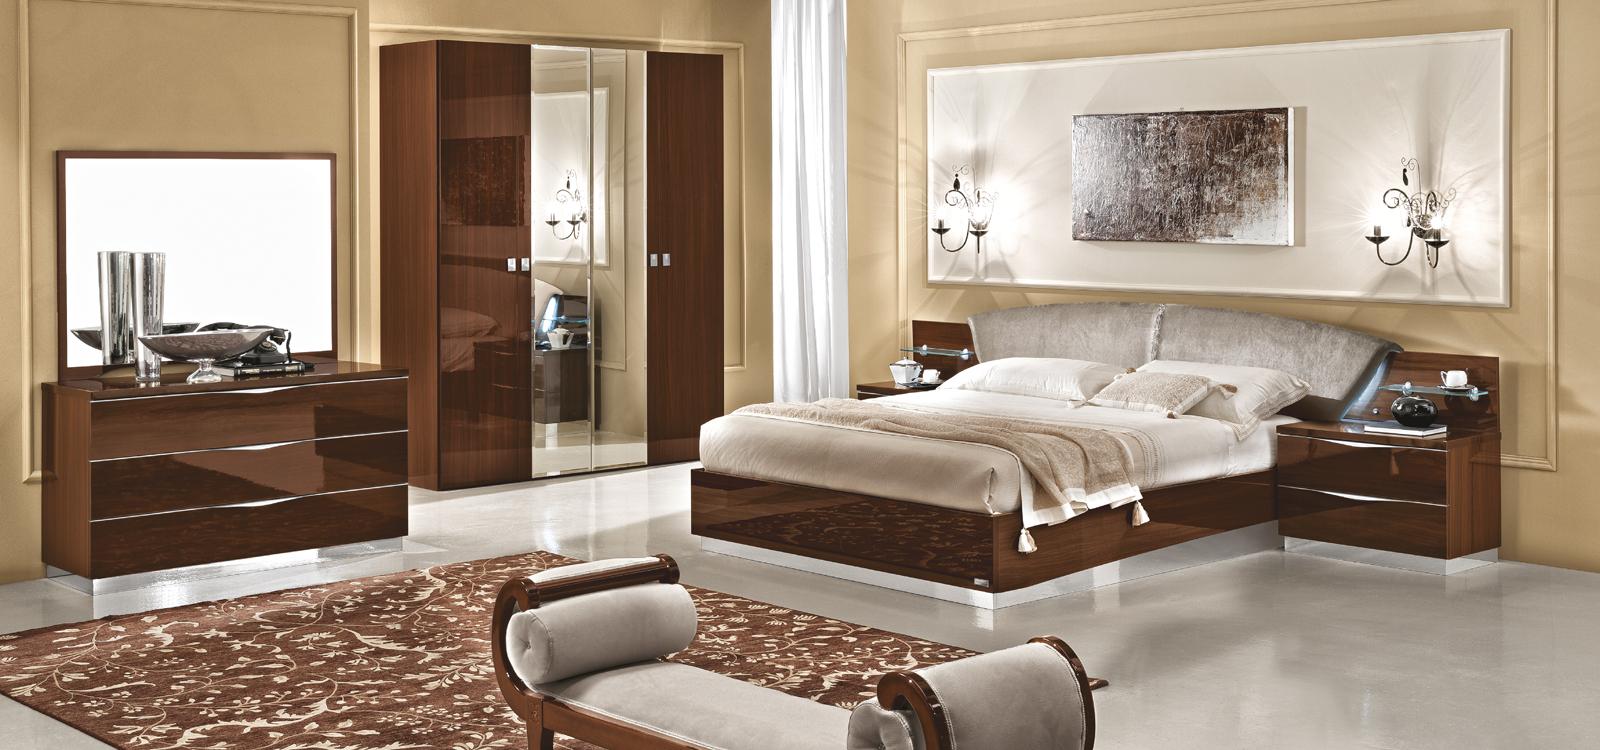 Made In Italy Wood Bedroom Set Design With Extra Storage Seattle Washington Esf Onda Walnut